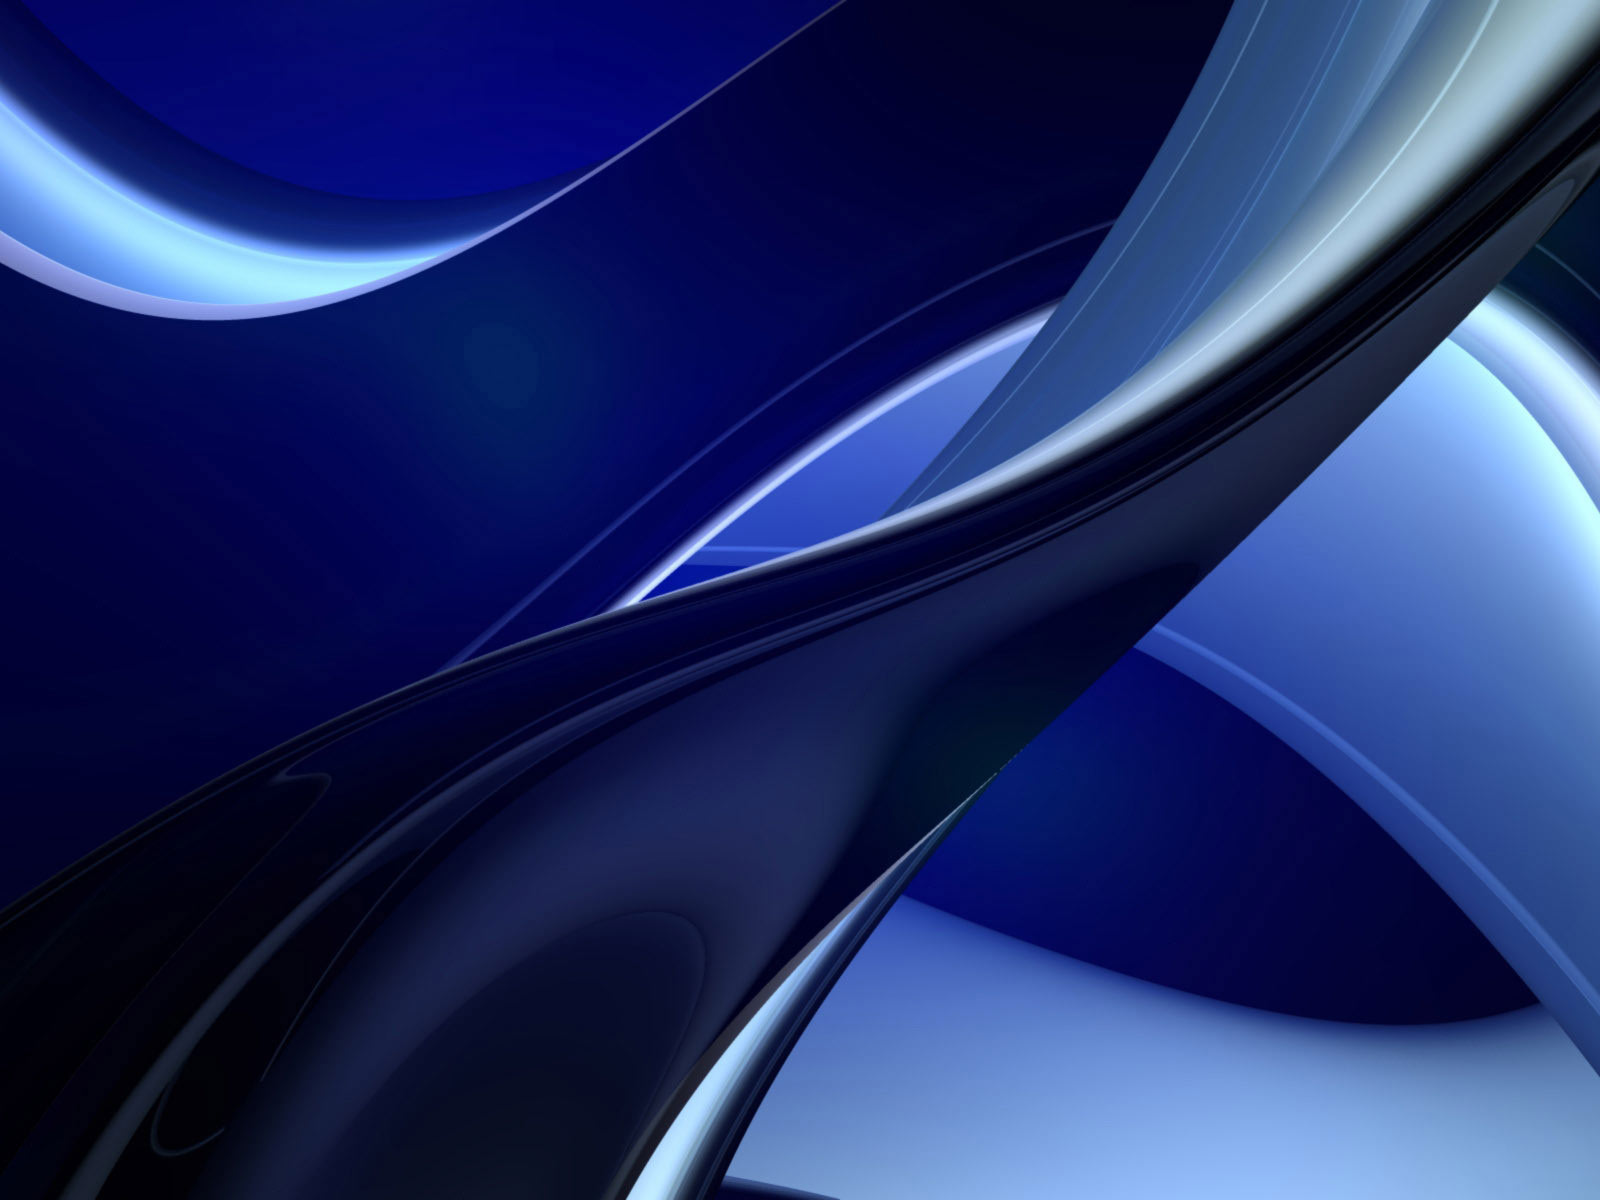 Blue Desktop Wallpaper Maybe Navy Blue 1600x1200